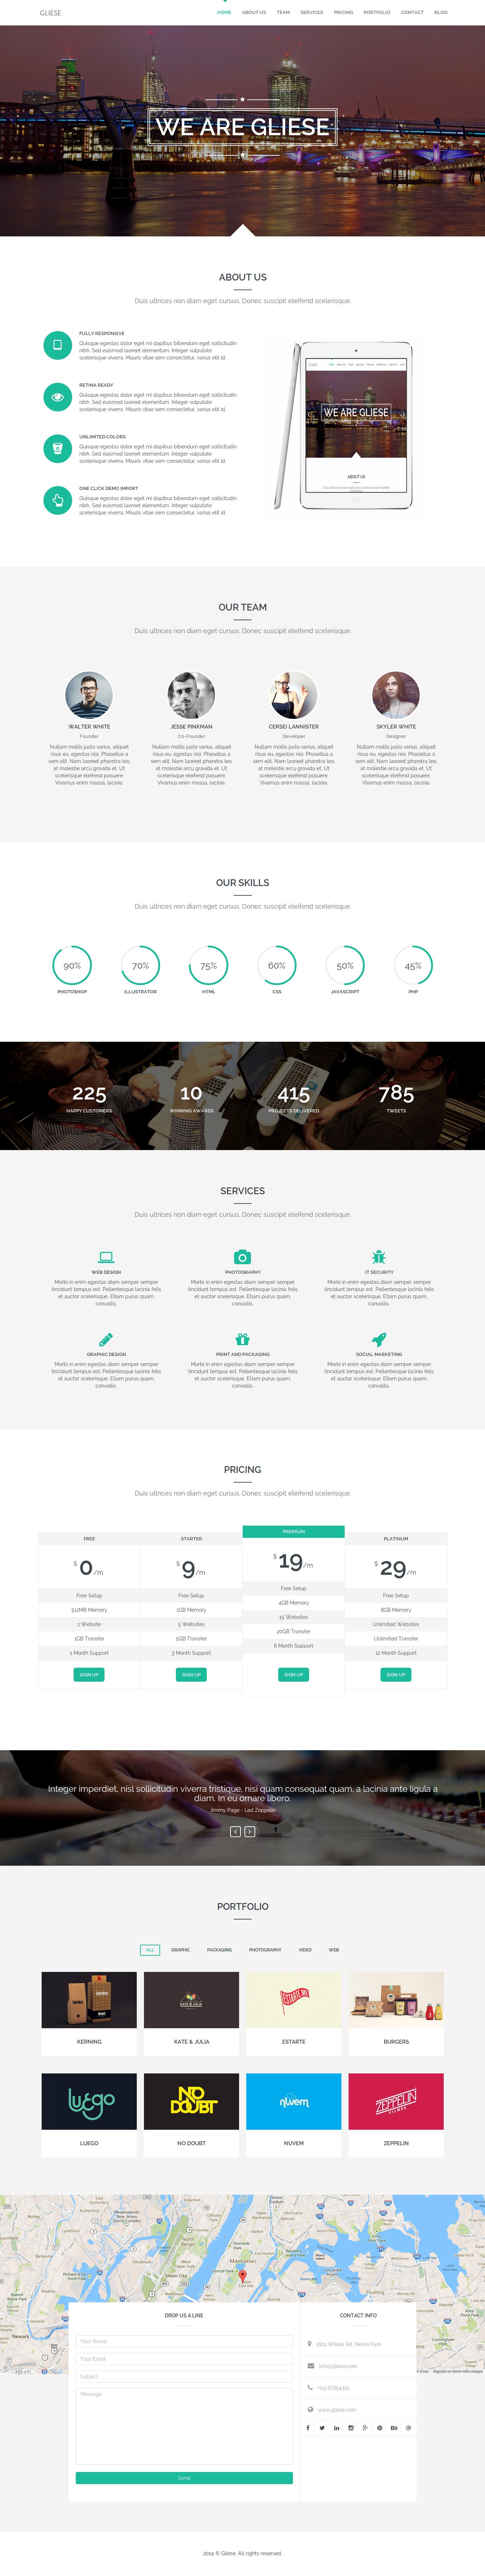 Gliese is a modern and creative WordPress theme, perfect